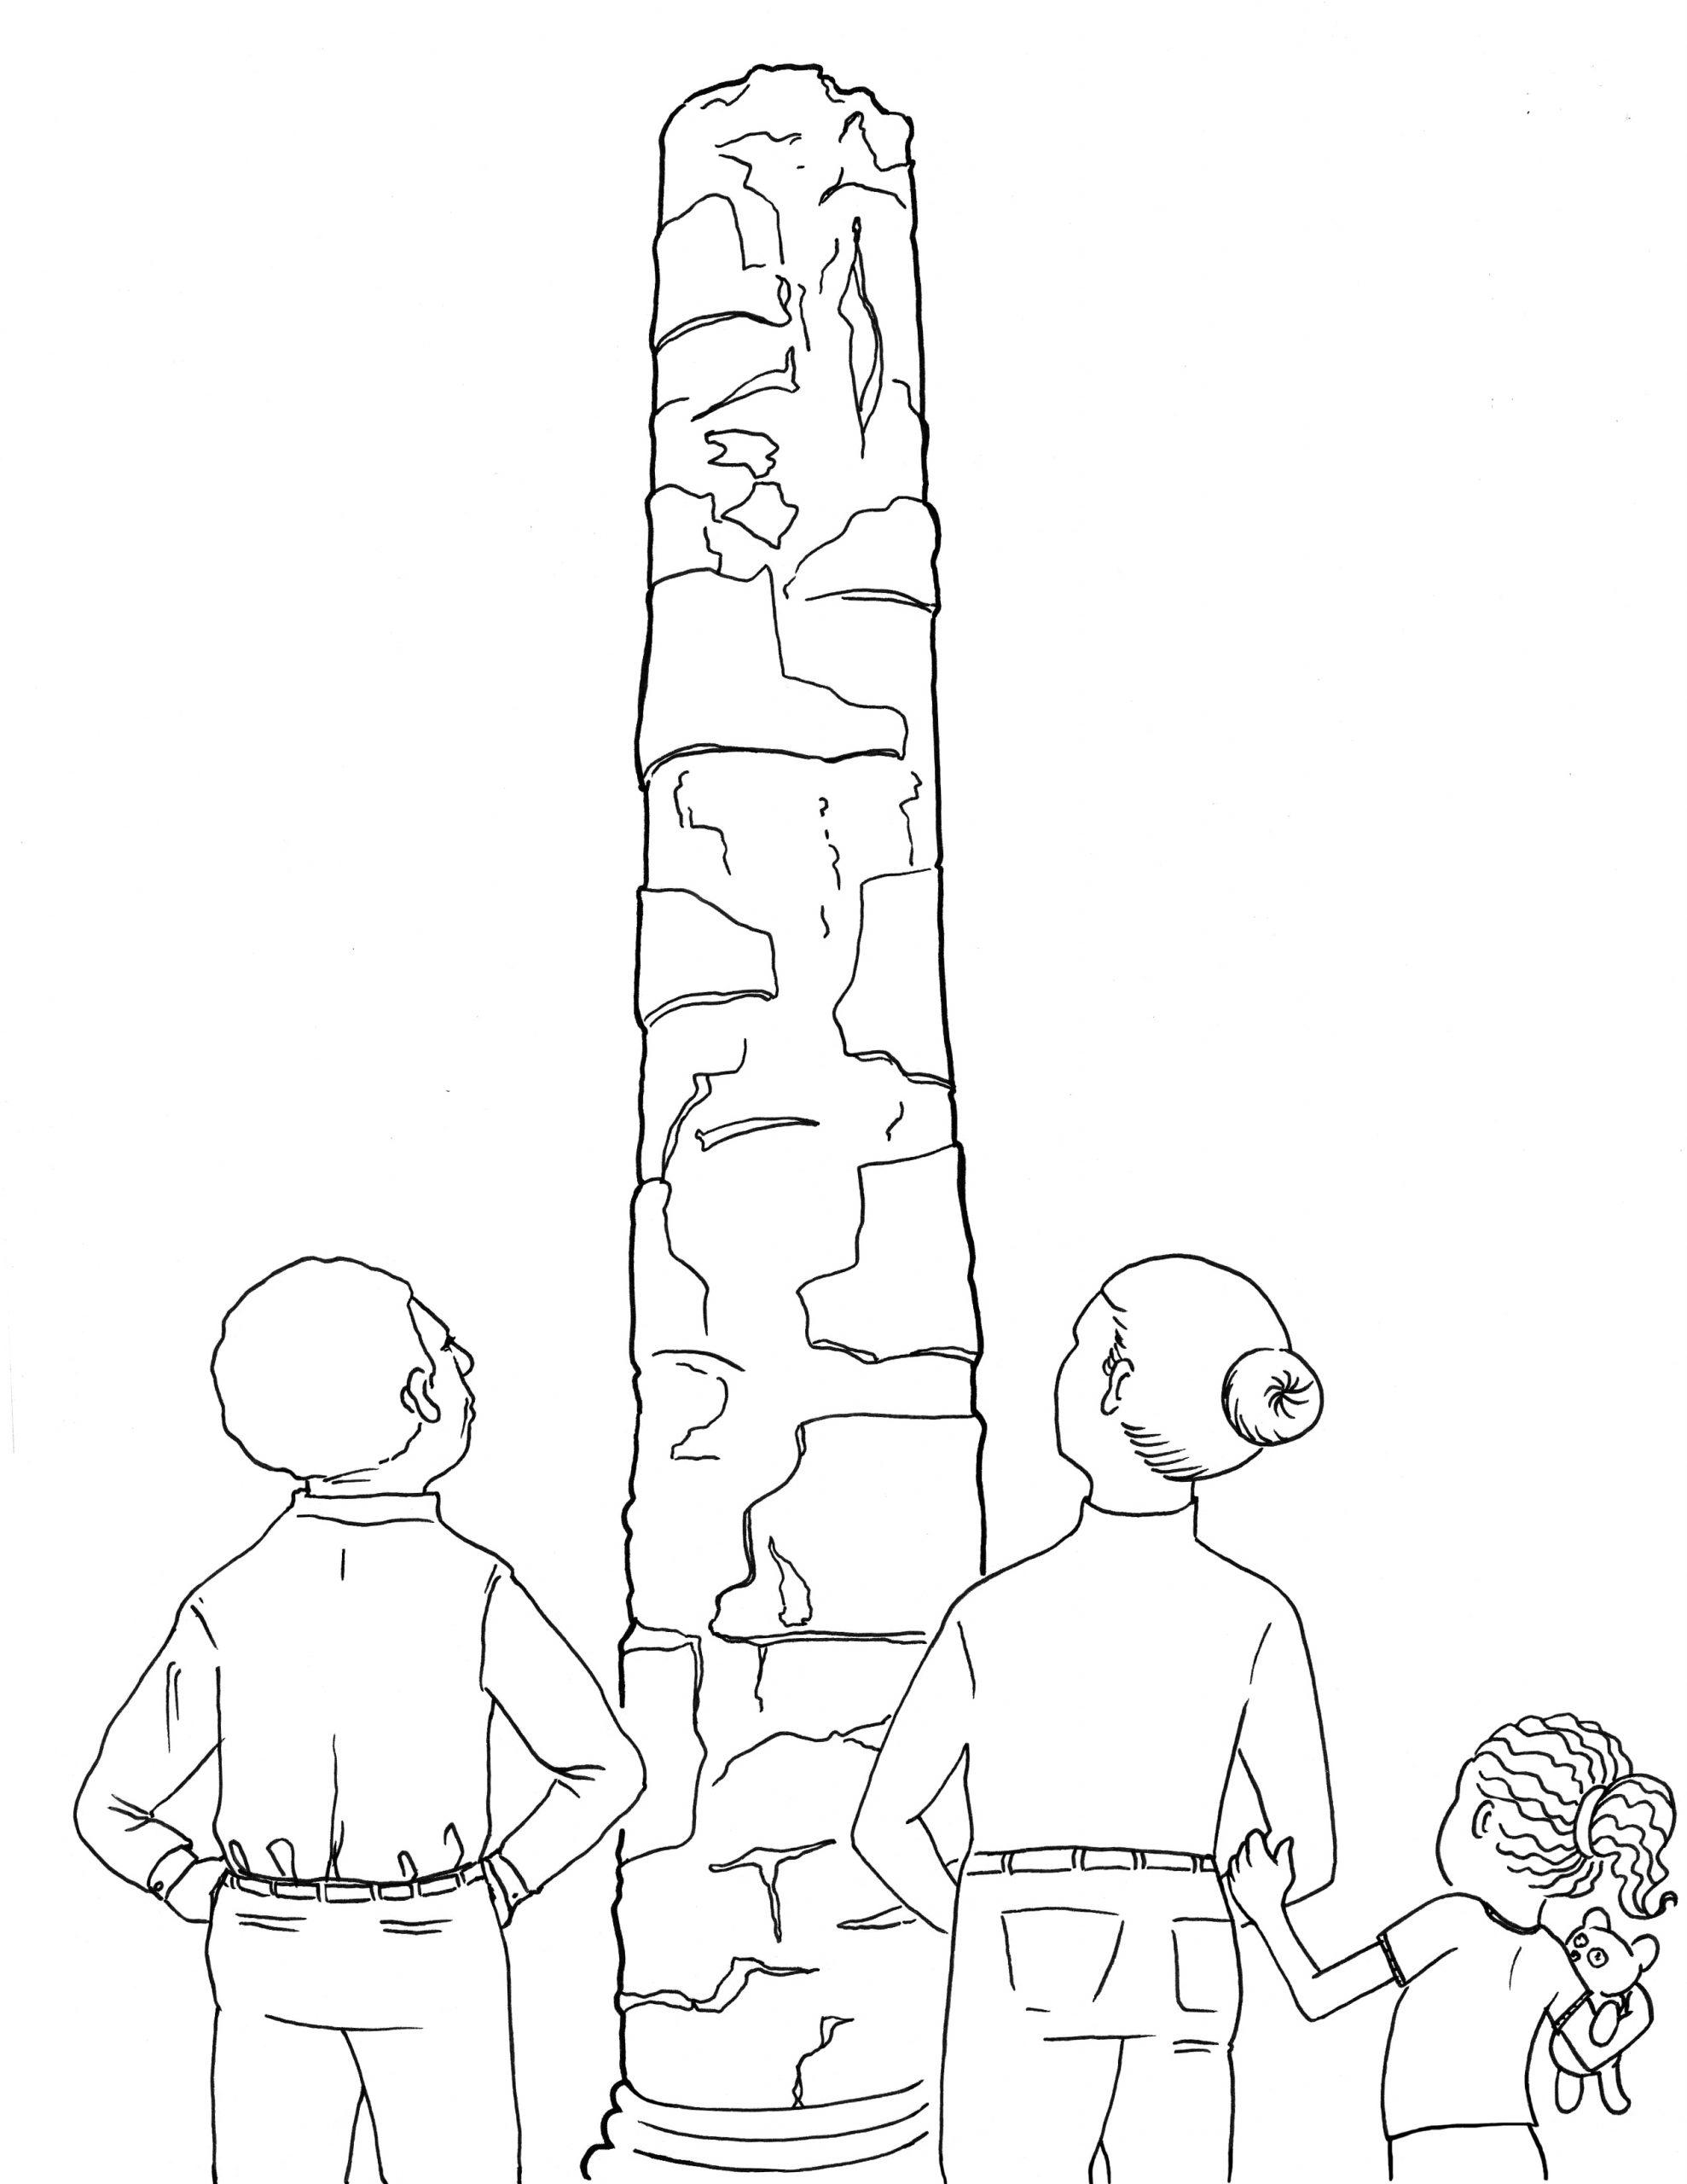 Coloring page inspired by Sun Yuan Peng Yu, Civilization Pillar